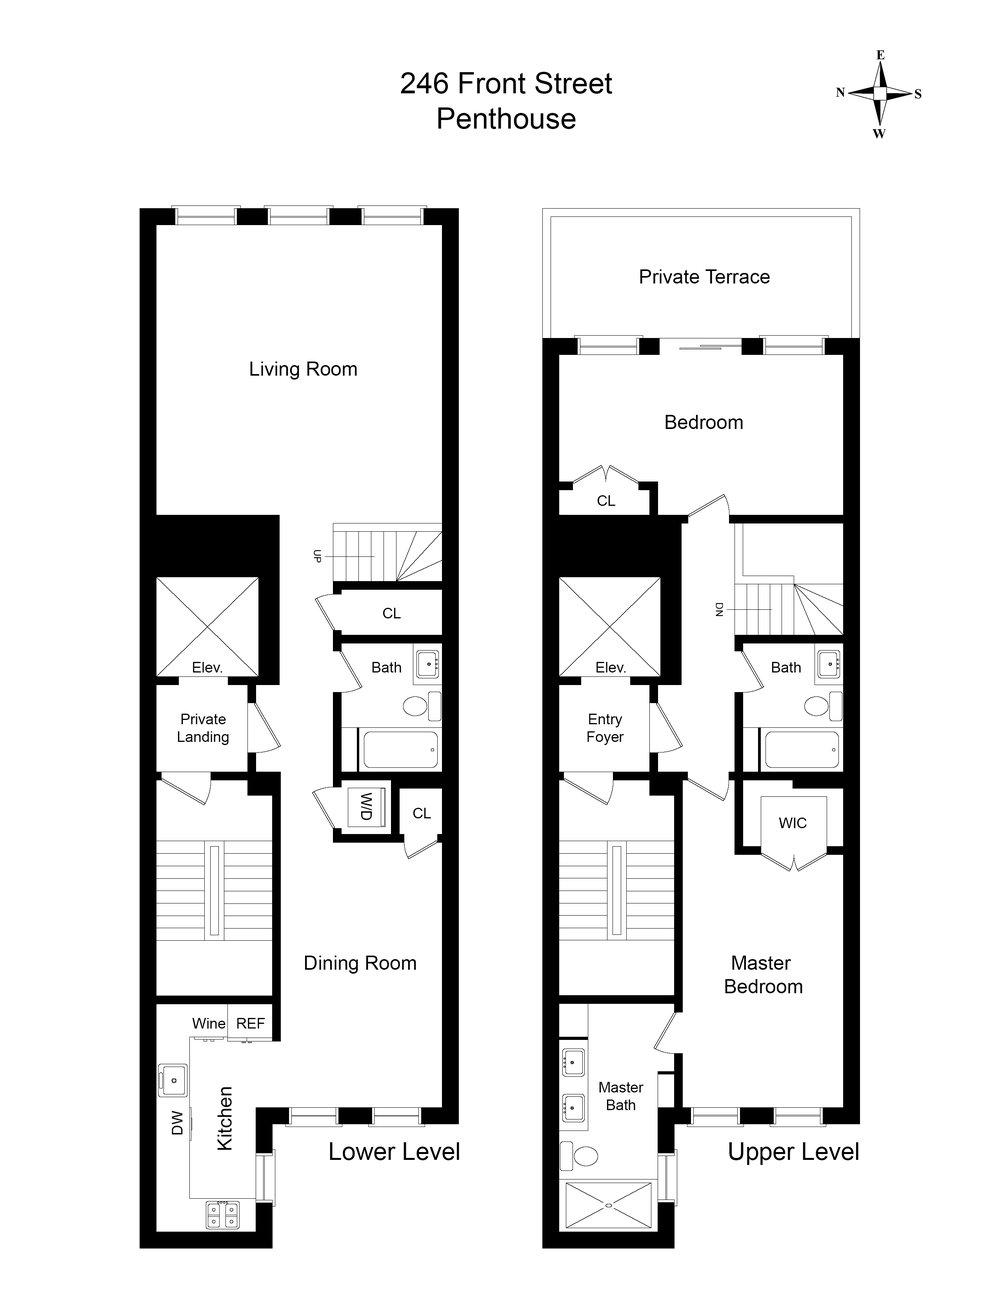 Floor Plan - 246 Front Street Penthouse NO DIMS.jpg